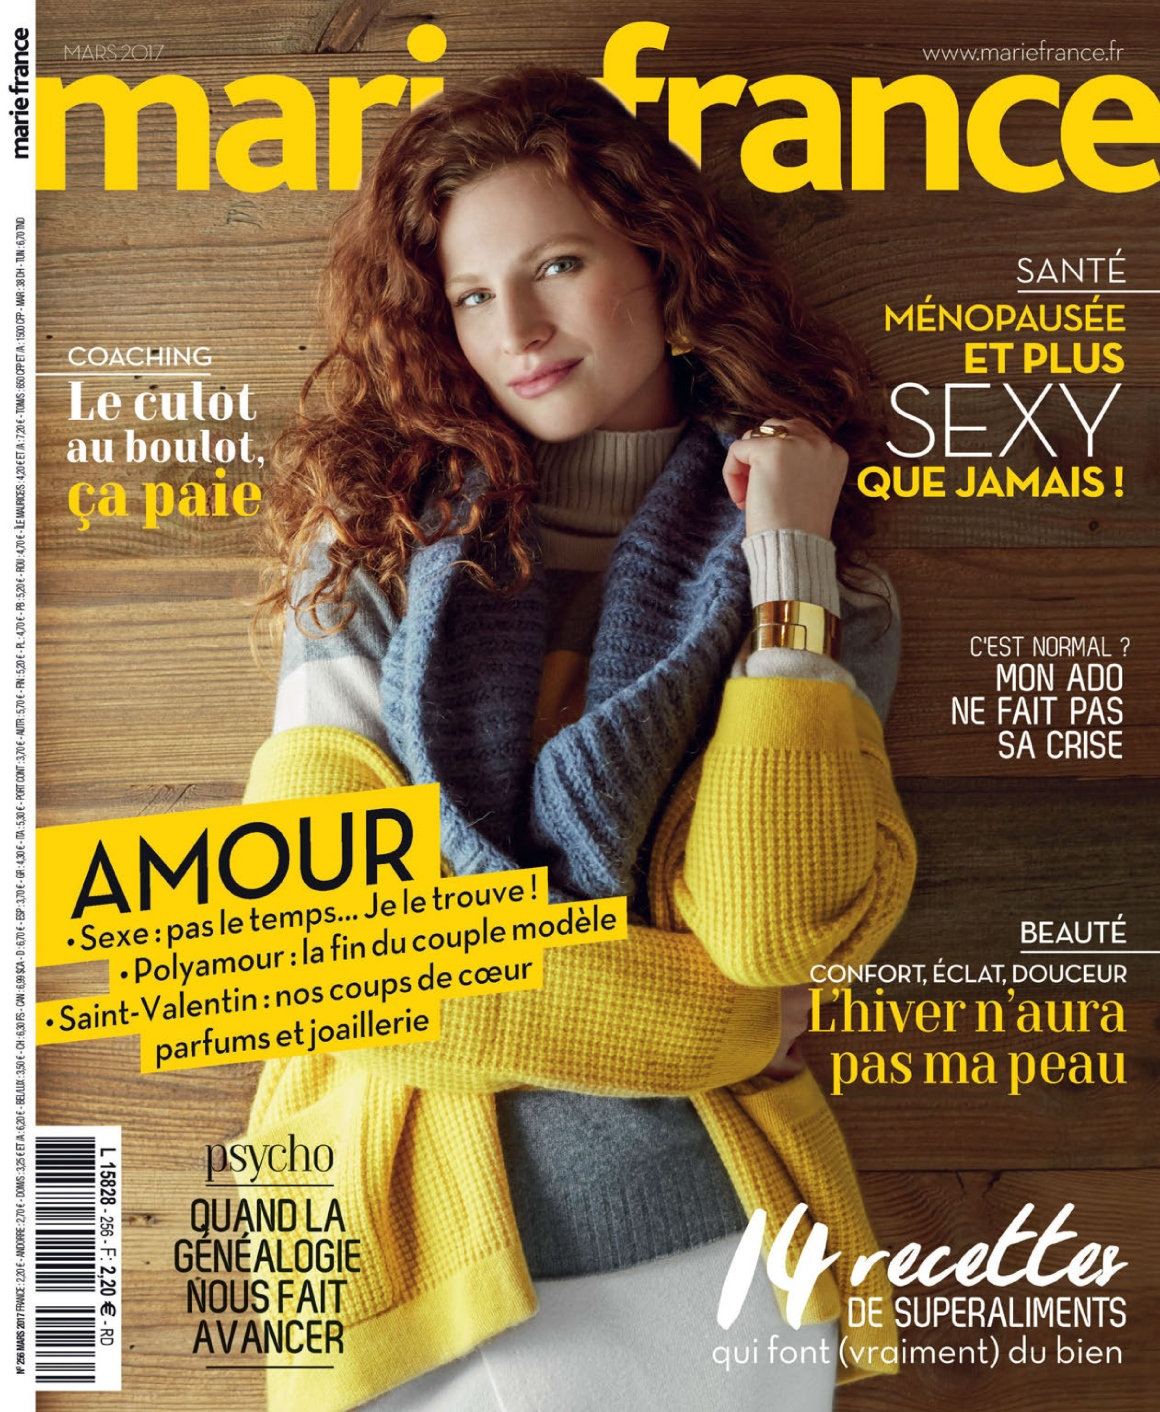 Marie France N°256 - Mars 2017